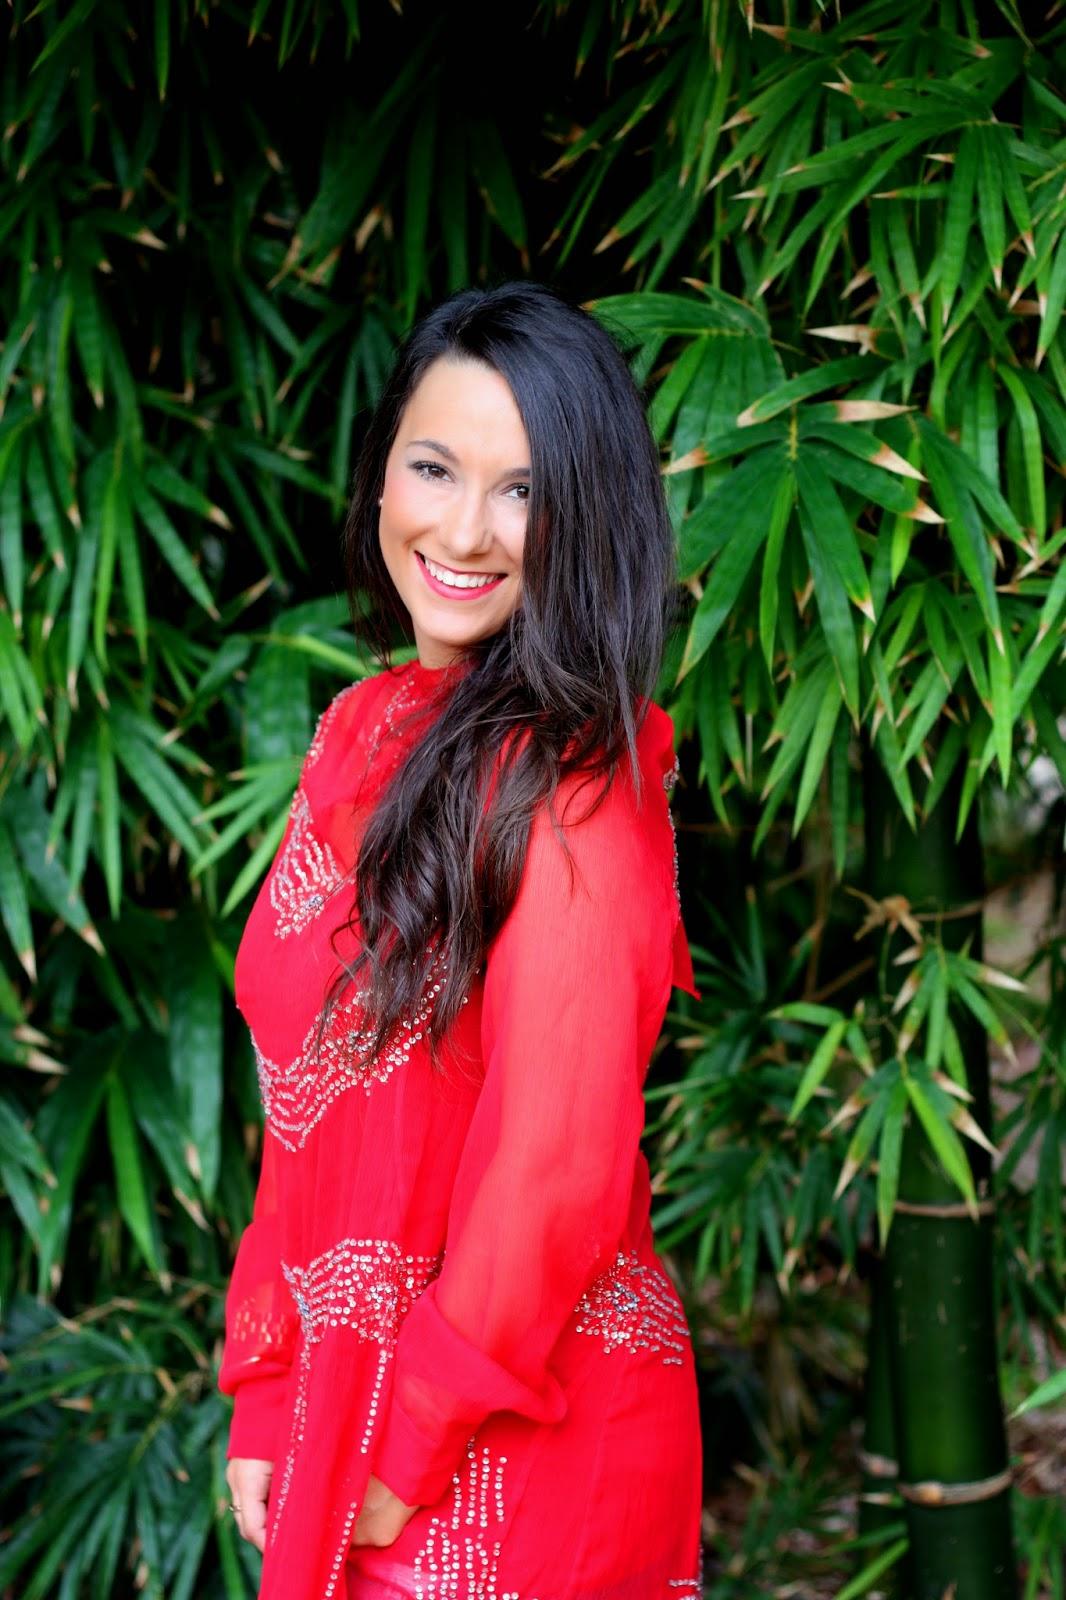 http://silviparalasamigas.blogspot.com.es/2014/10/look-xvii-valencia-fashion-week.html